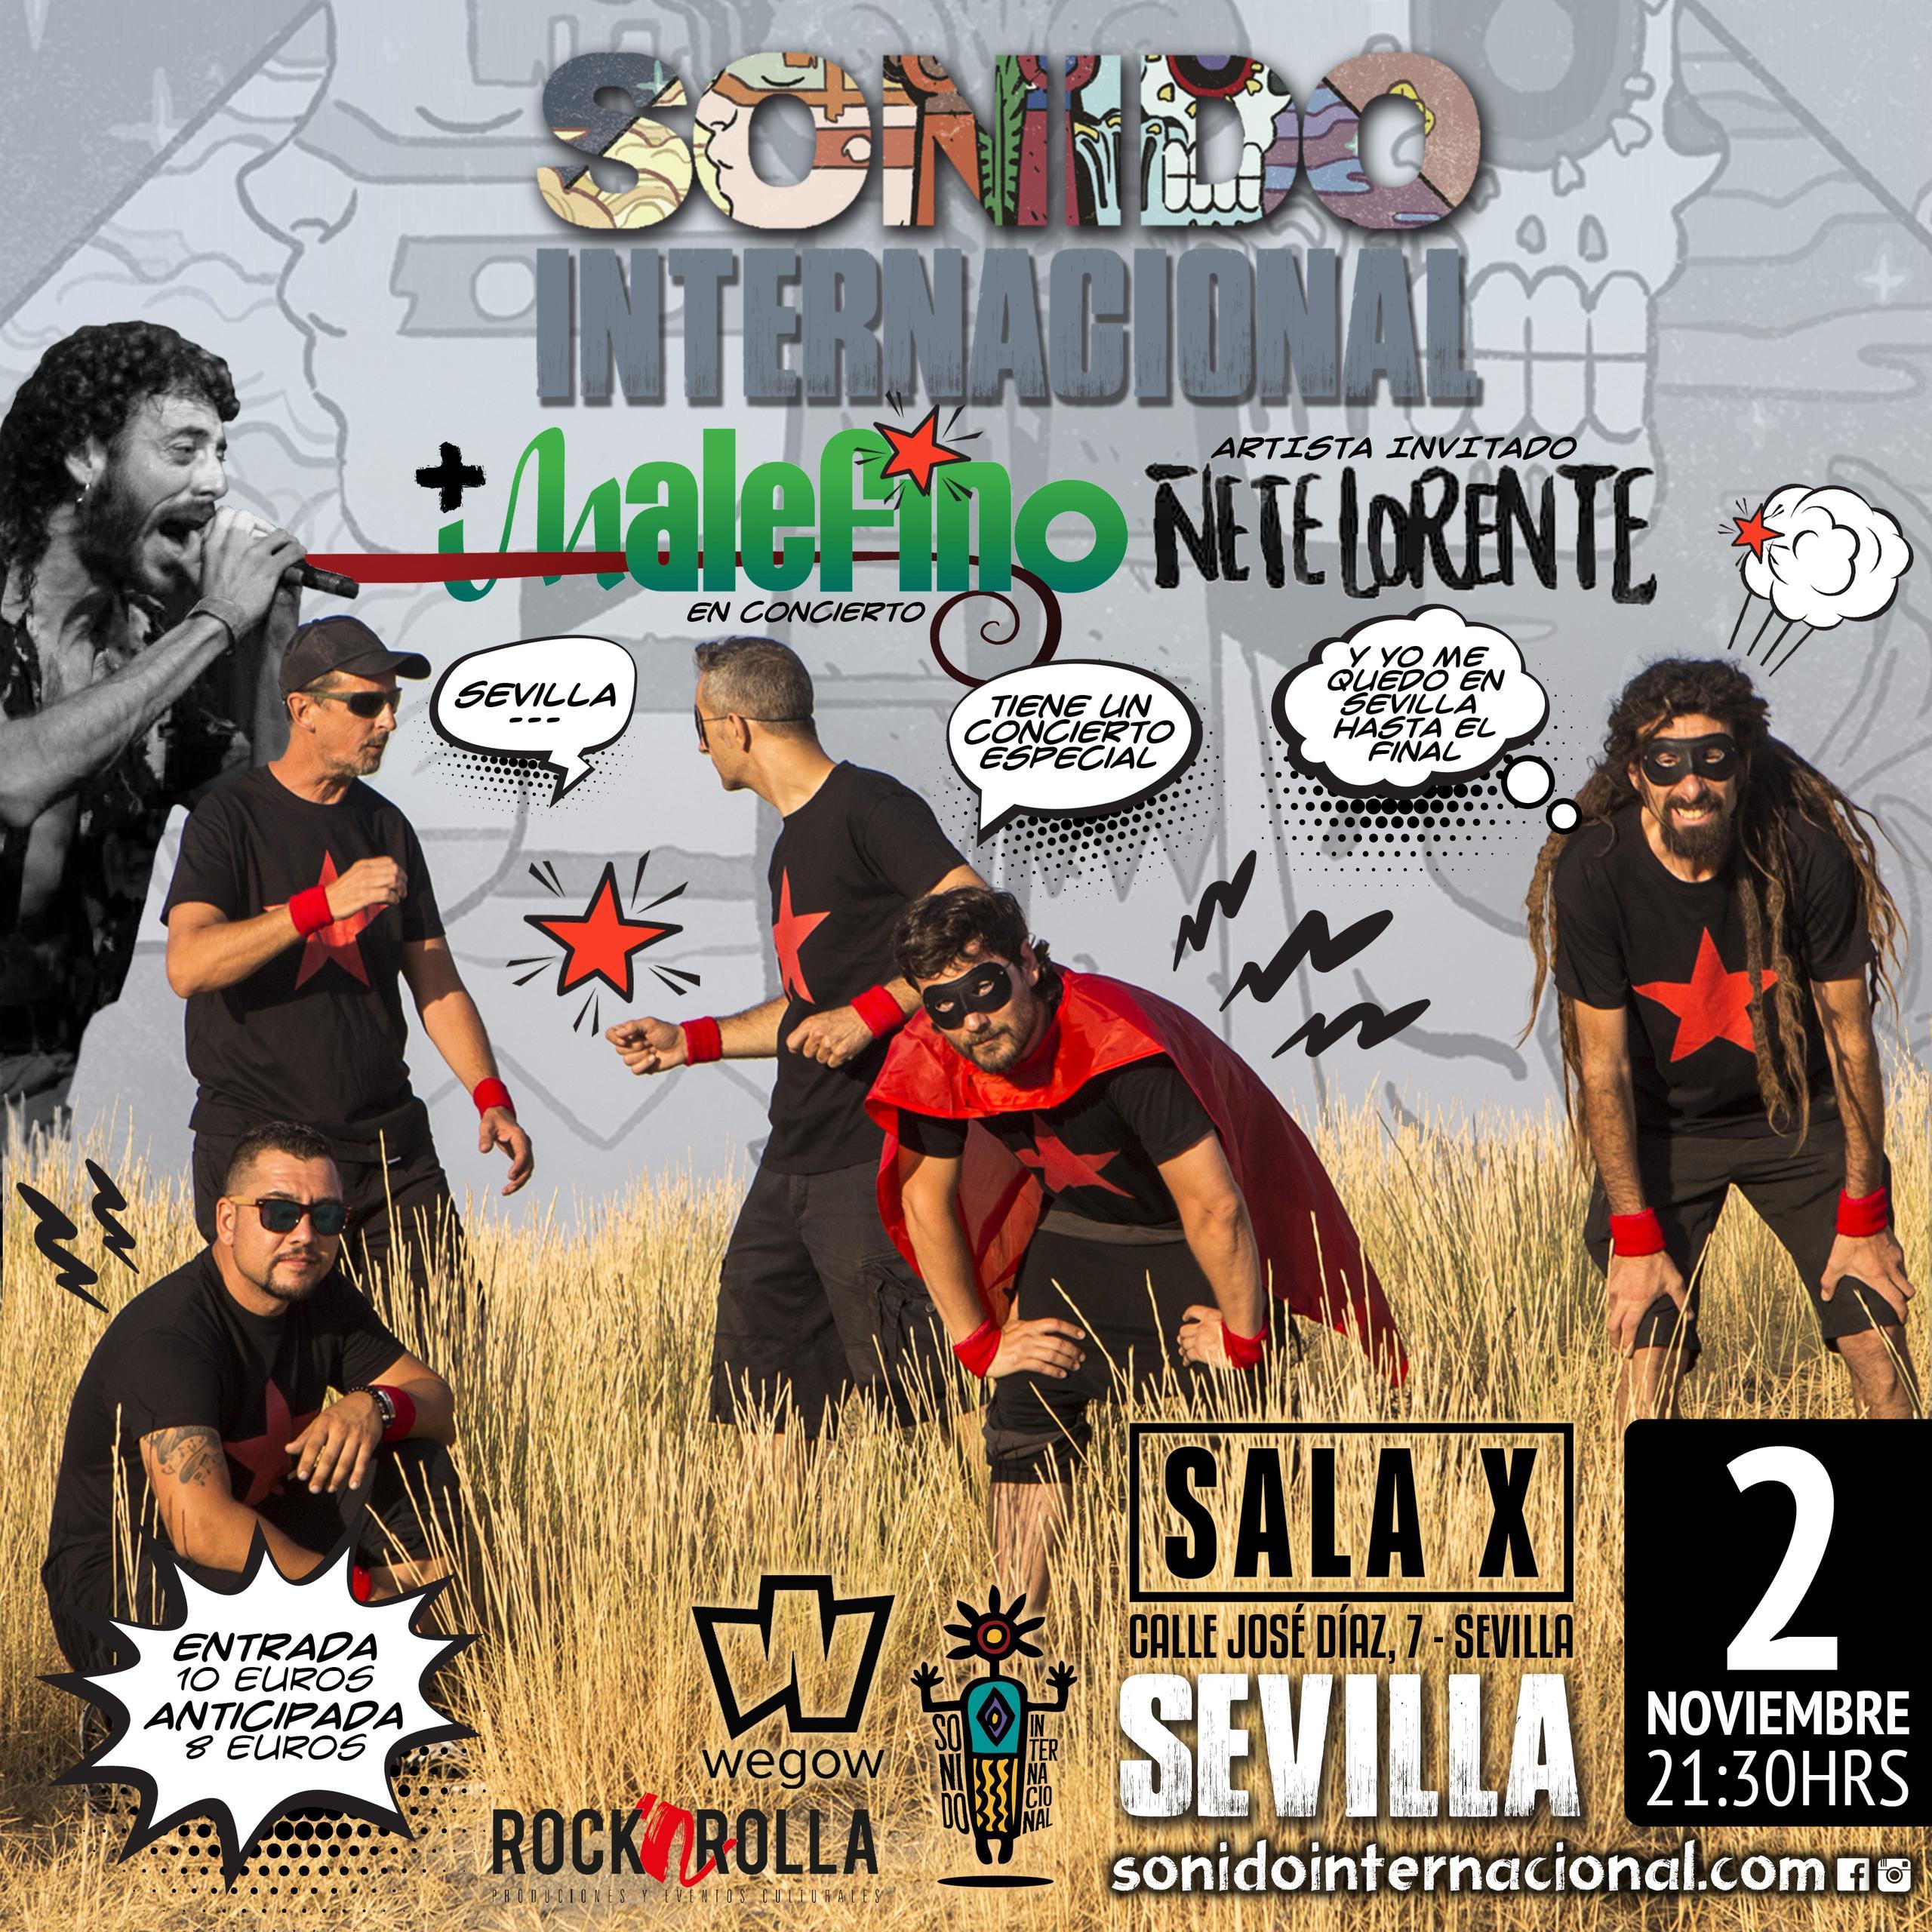 sonido internacional + Malefino